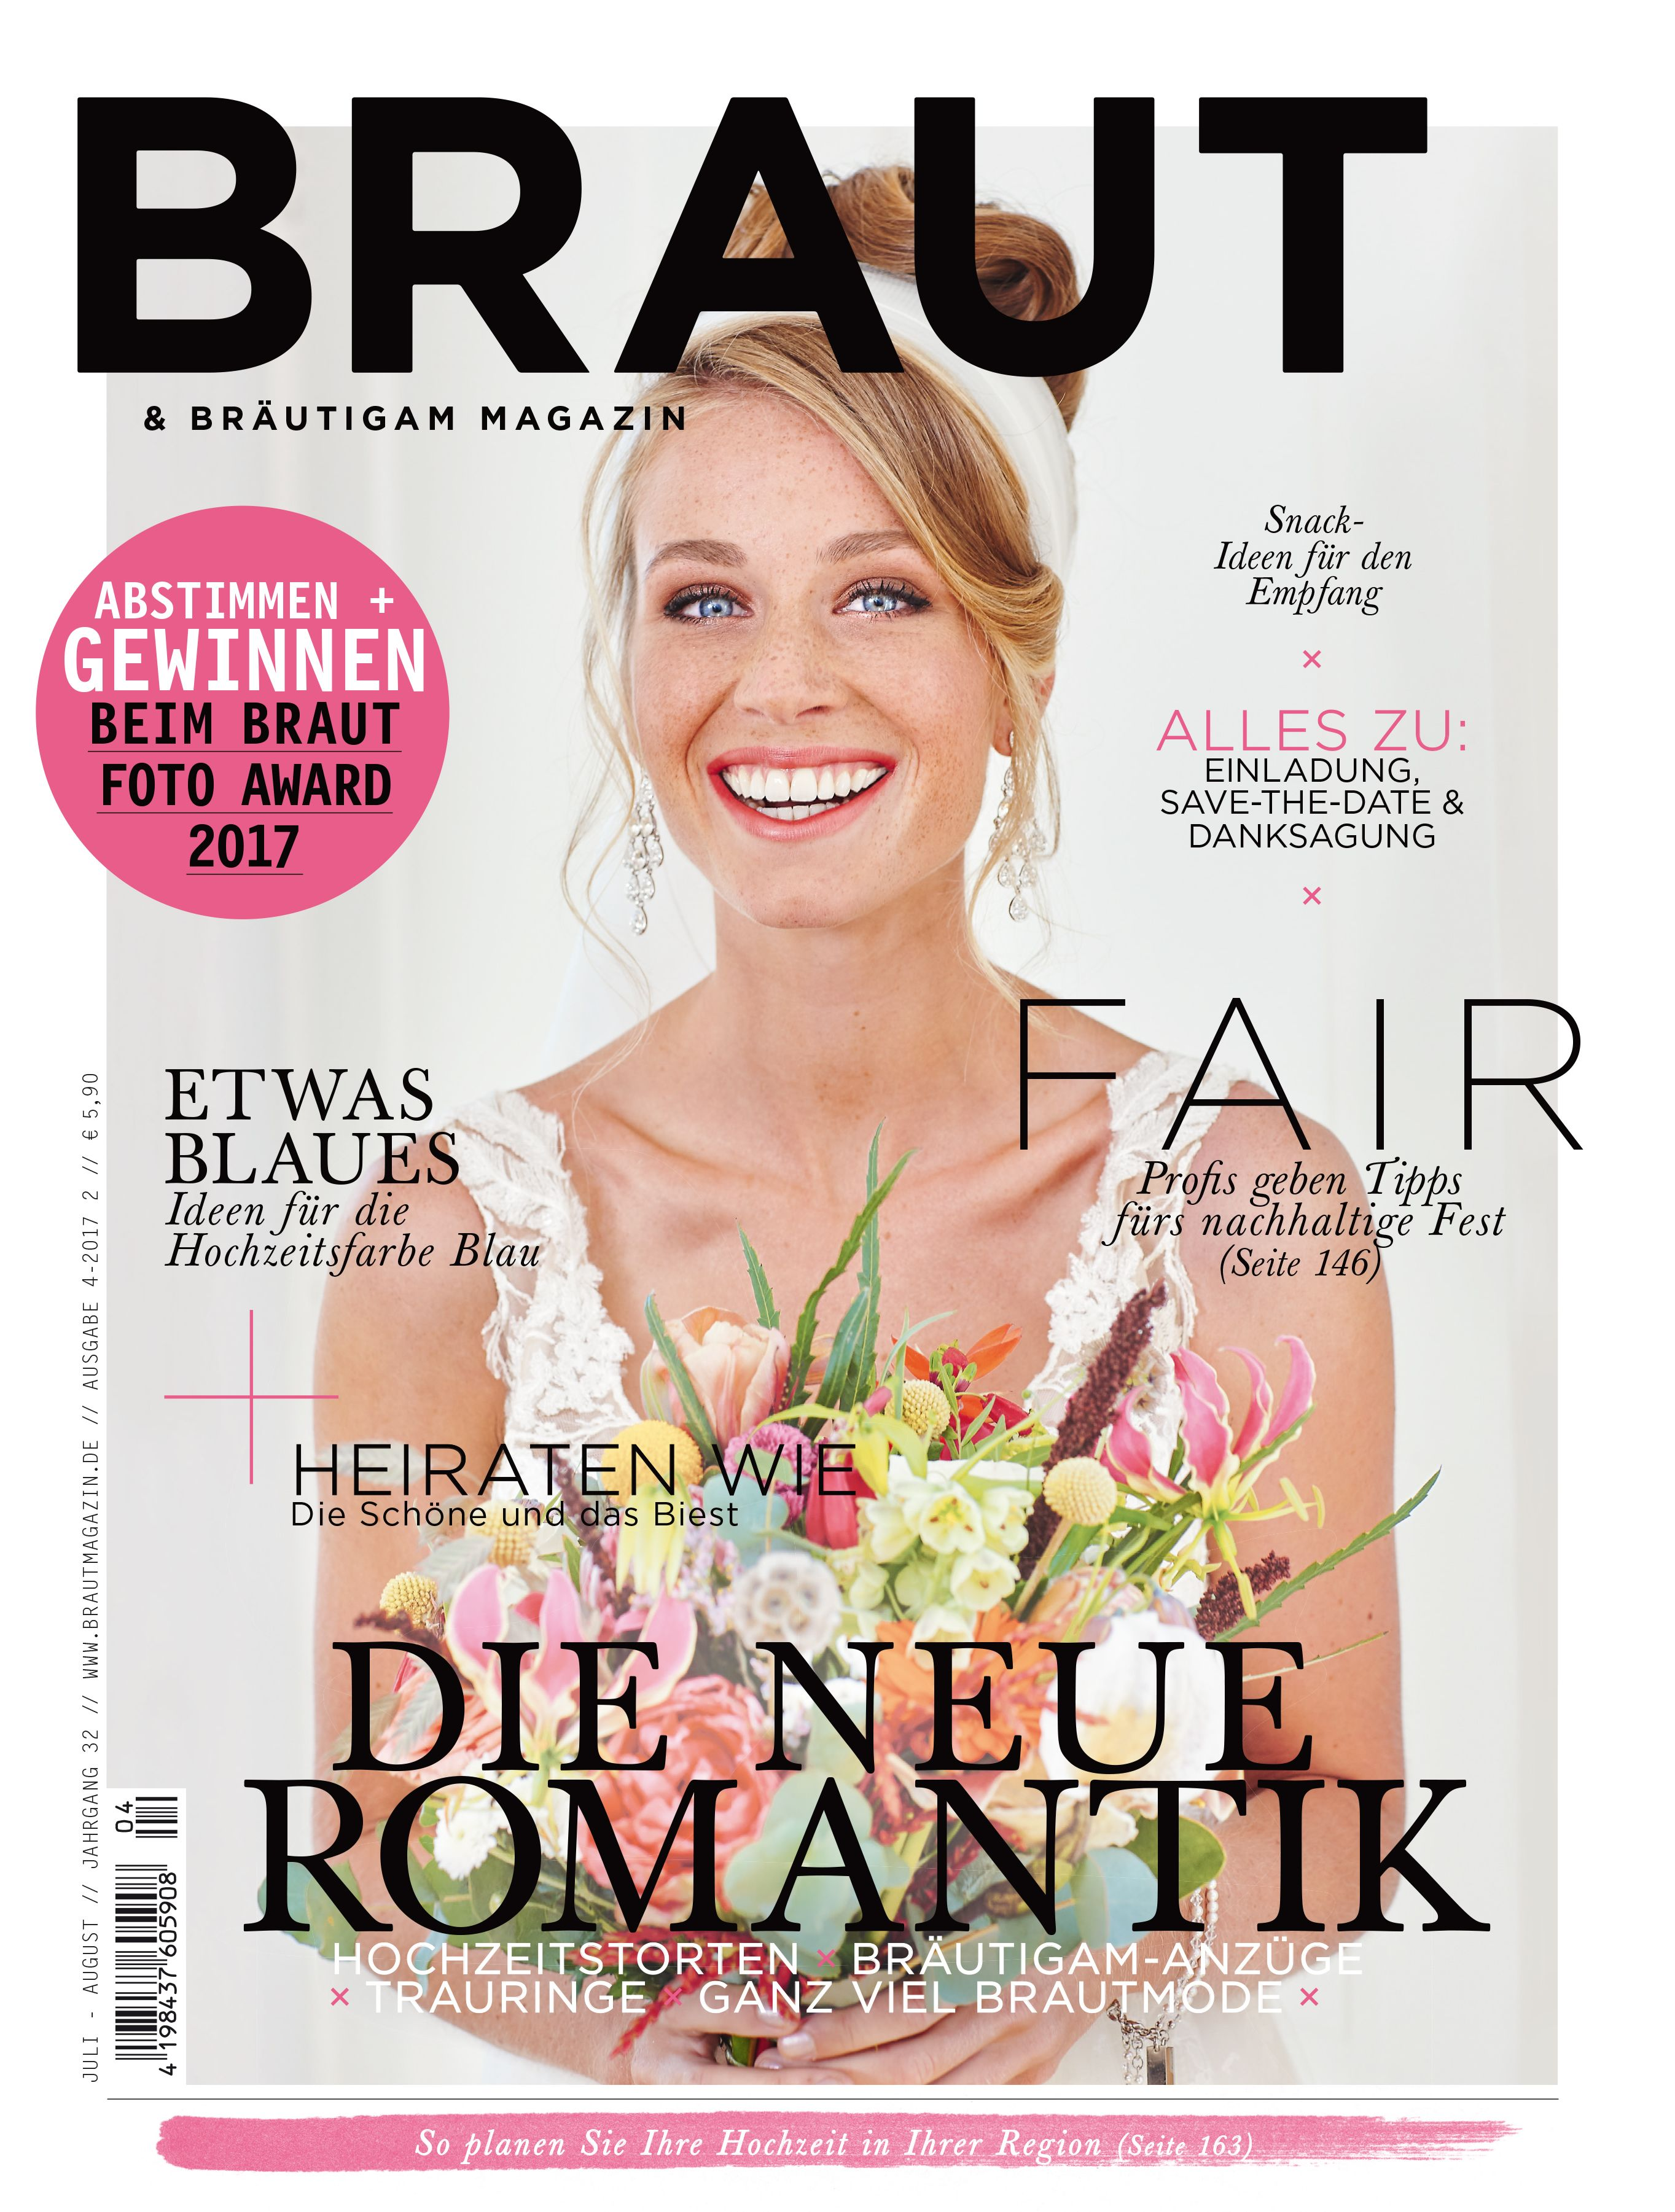 Braut & Bräutigam Magazin – Ausgabe 4-2017 #Brautmagazin ...